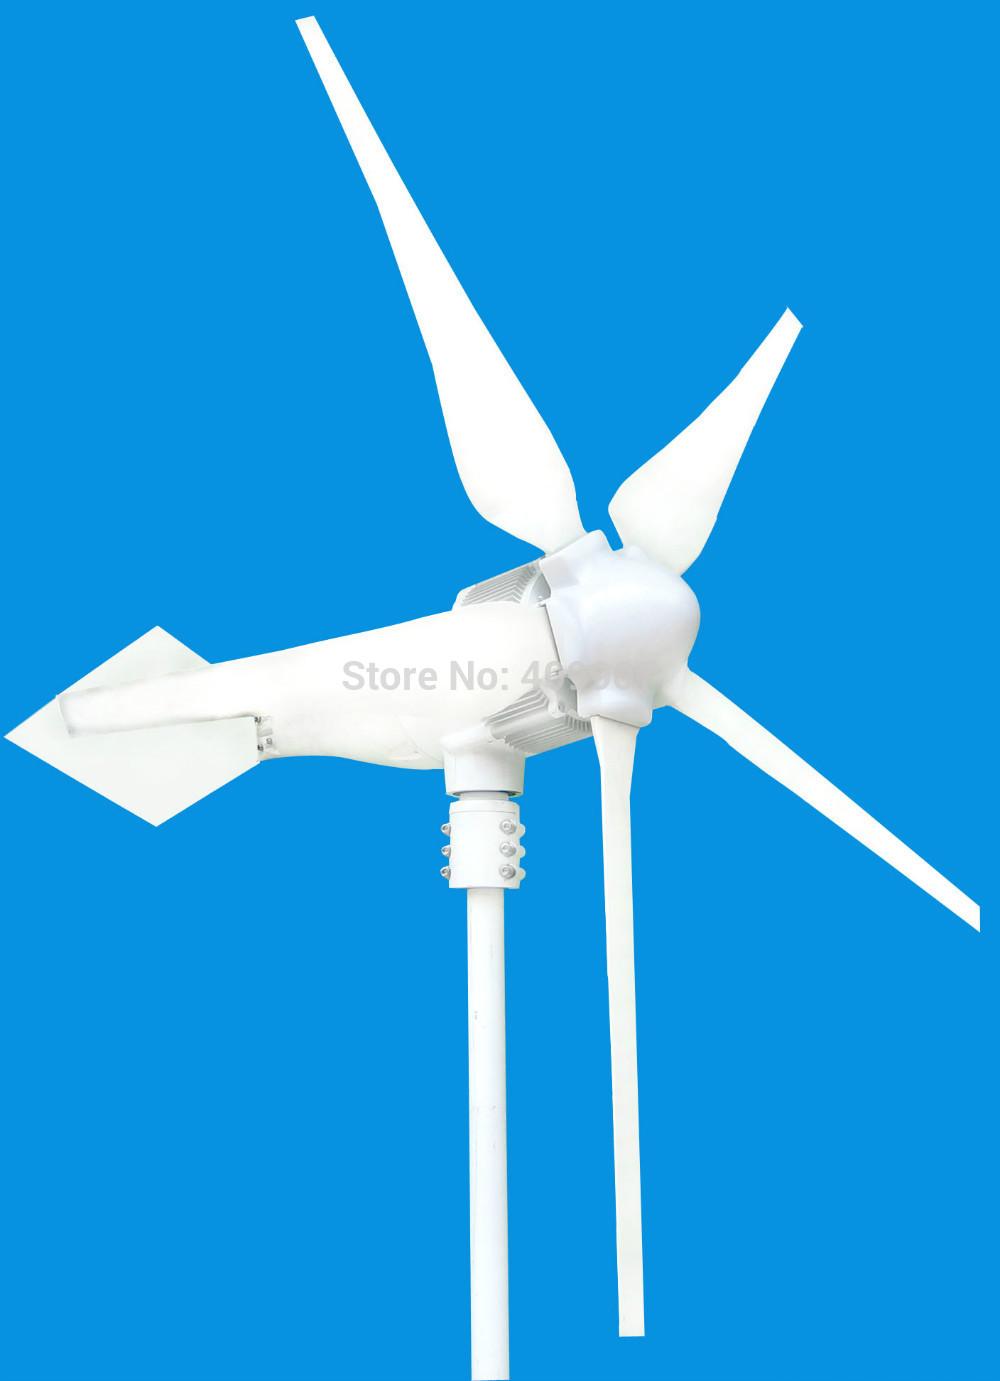 1pcs 5 blade wind turbine generator home wind power generator 800W on promotion(China (Mainland))